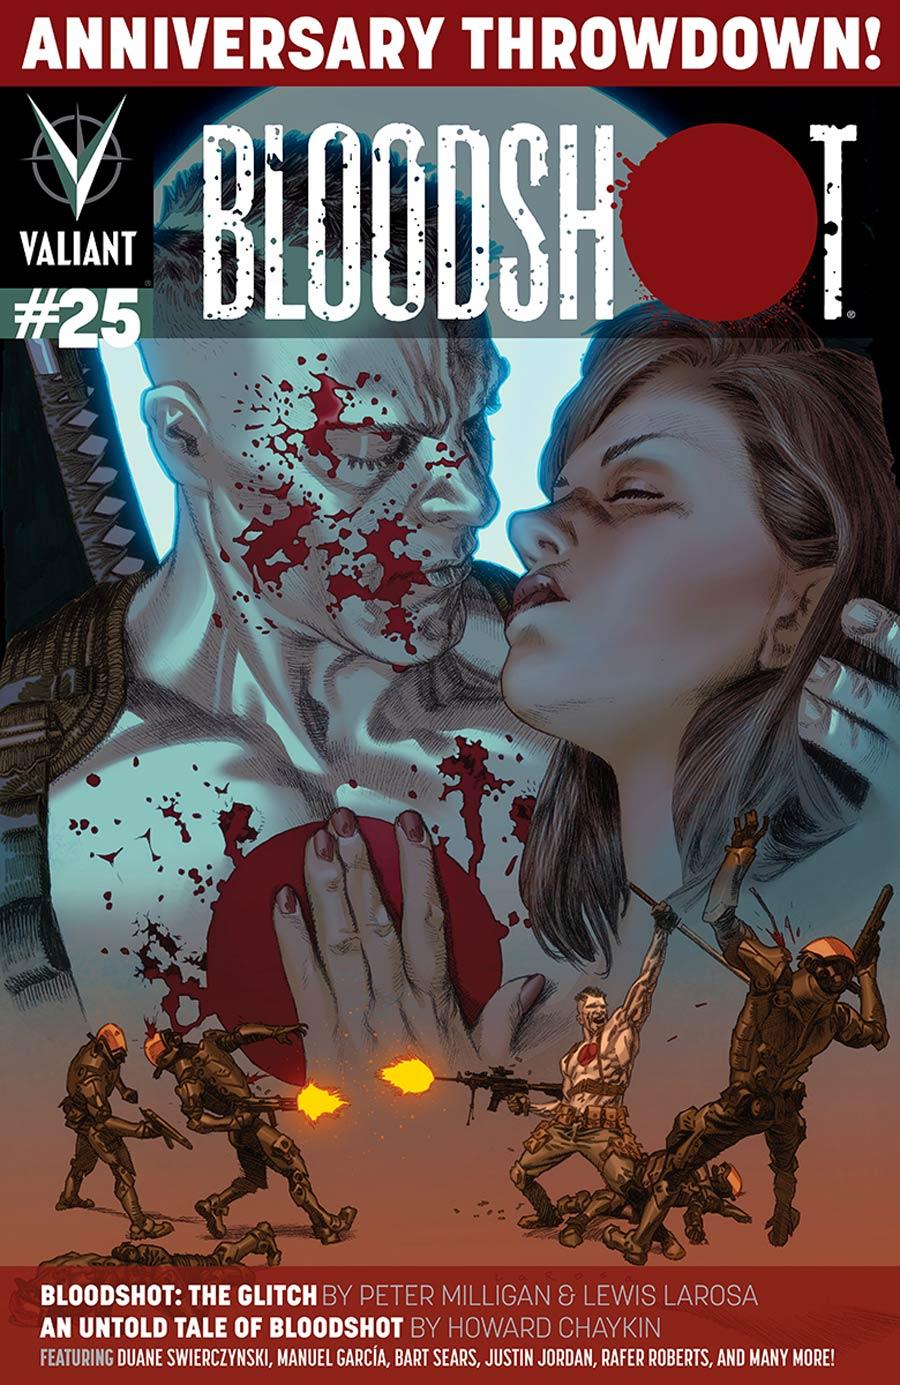 Bloodshot Vol 3 #25 Cover A Regular Lewis LaRosa Cover